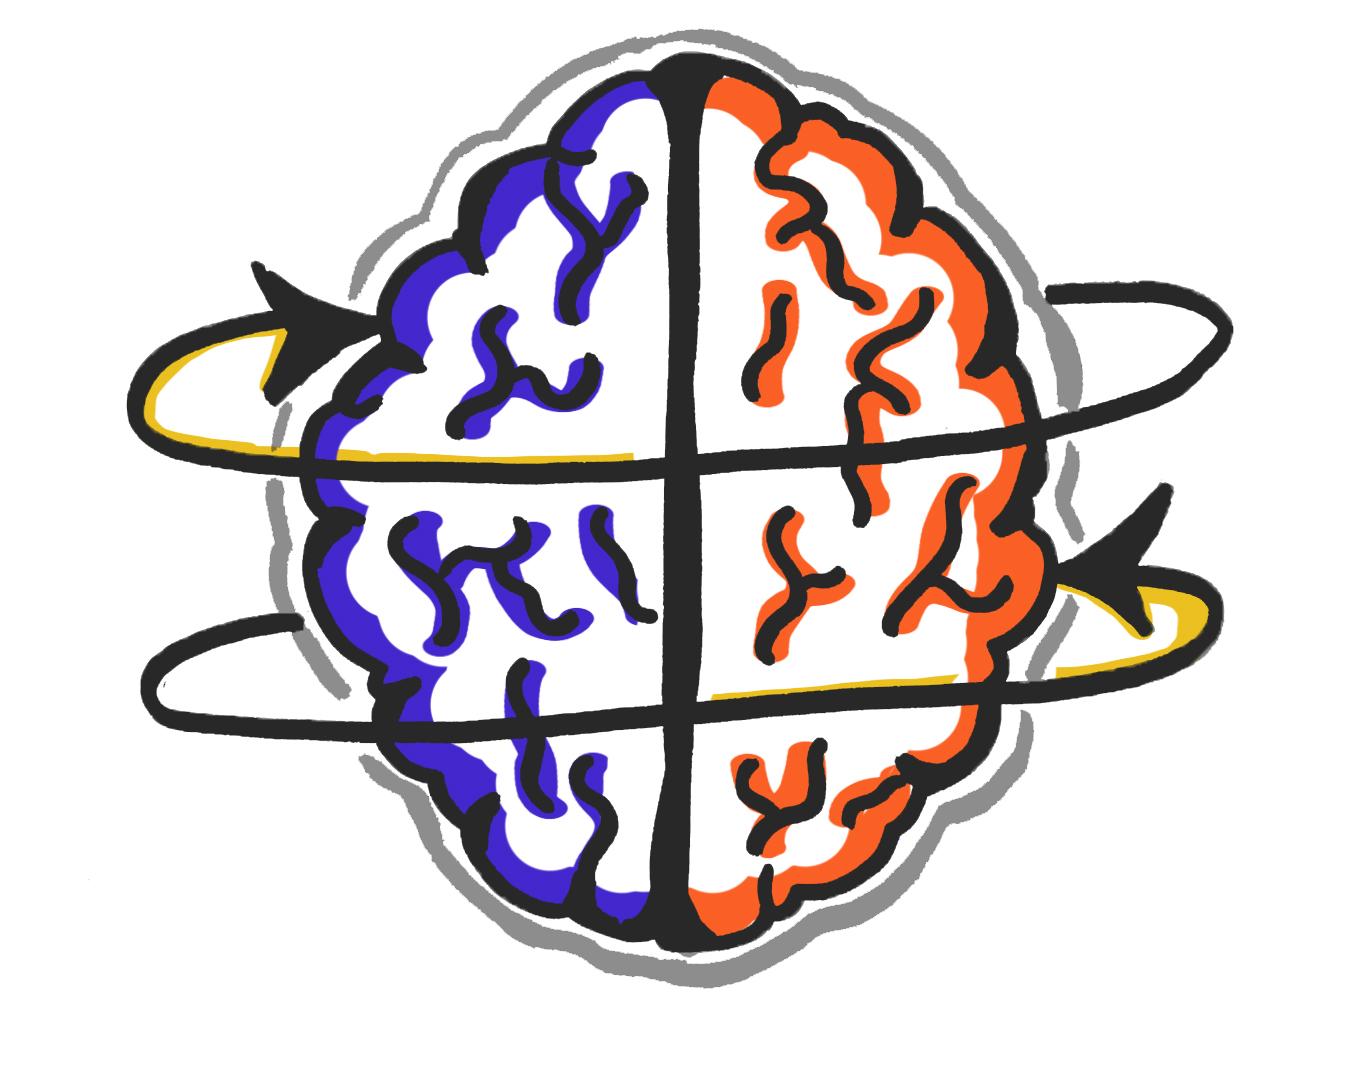 fast_brain.jpg